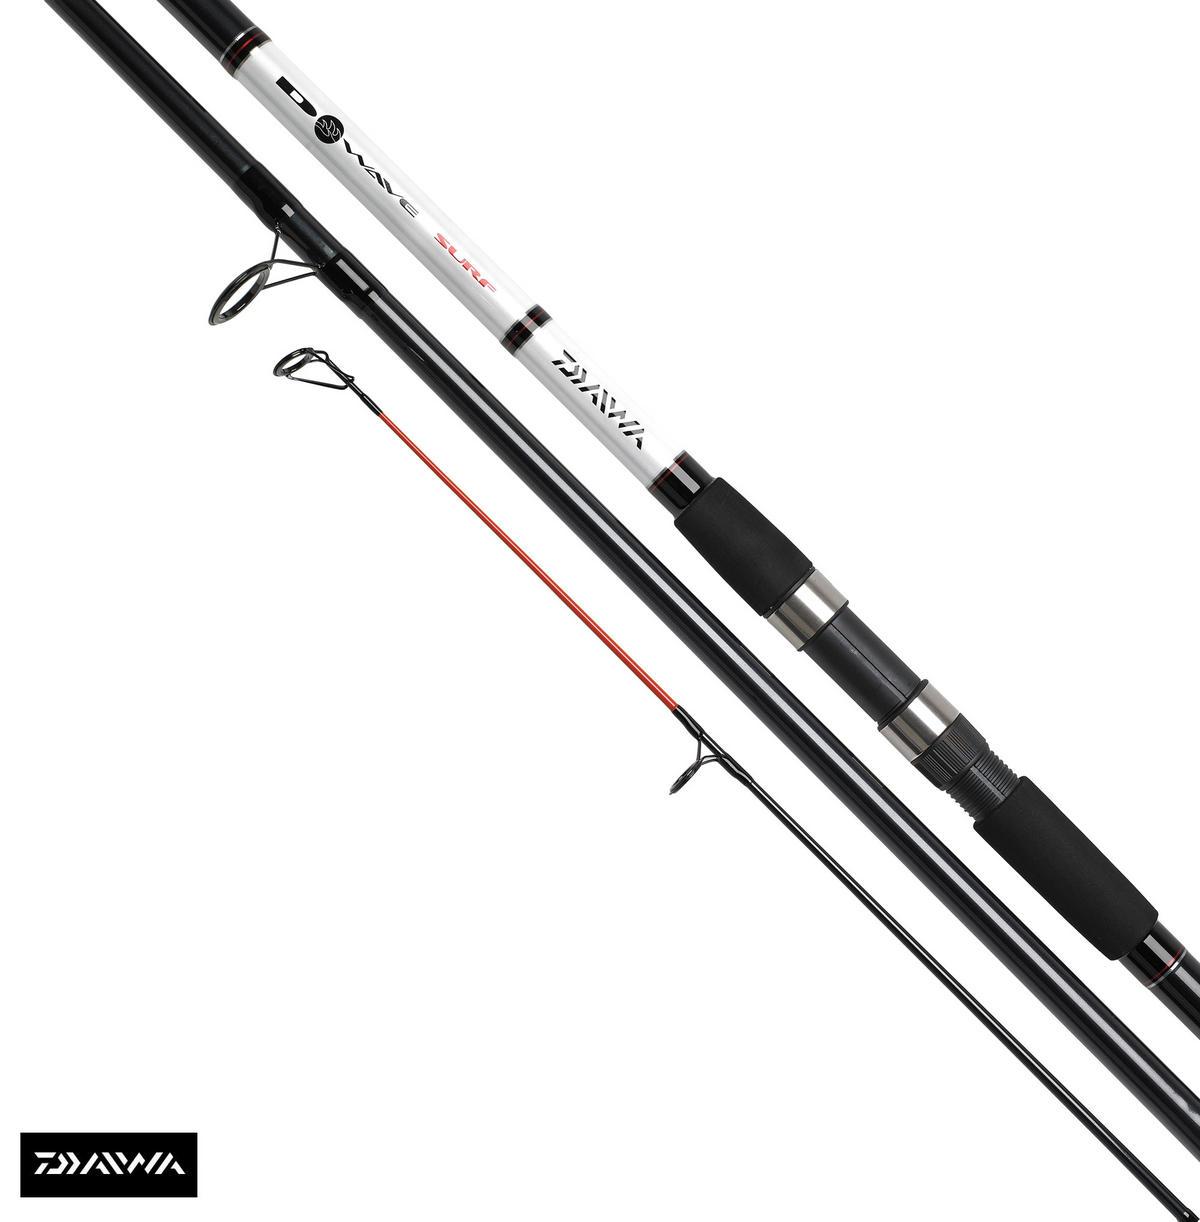 EX DISPLAY  Daiwa D Wave Surf Beach Fishing Rod 13' 3PC 4-8OZ Model No. DWS1303F